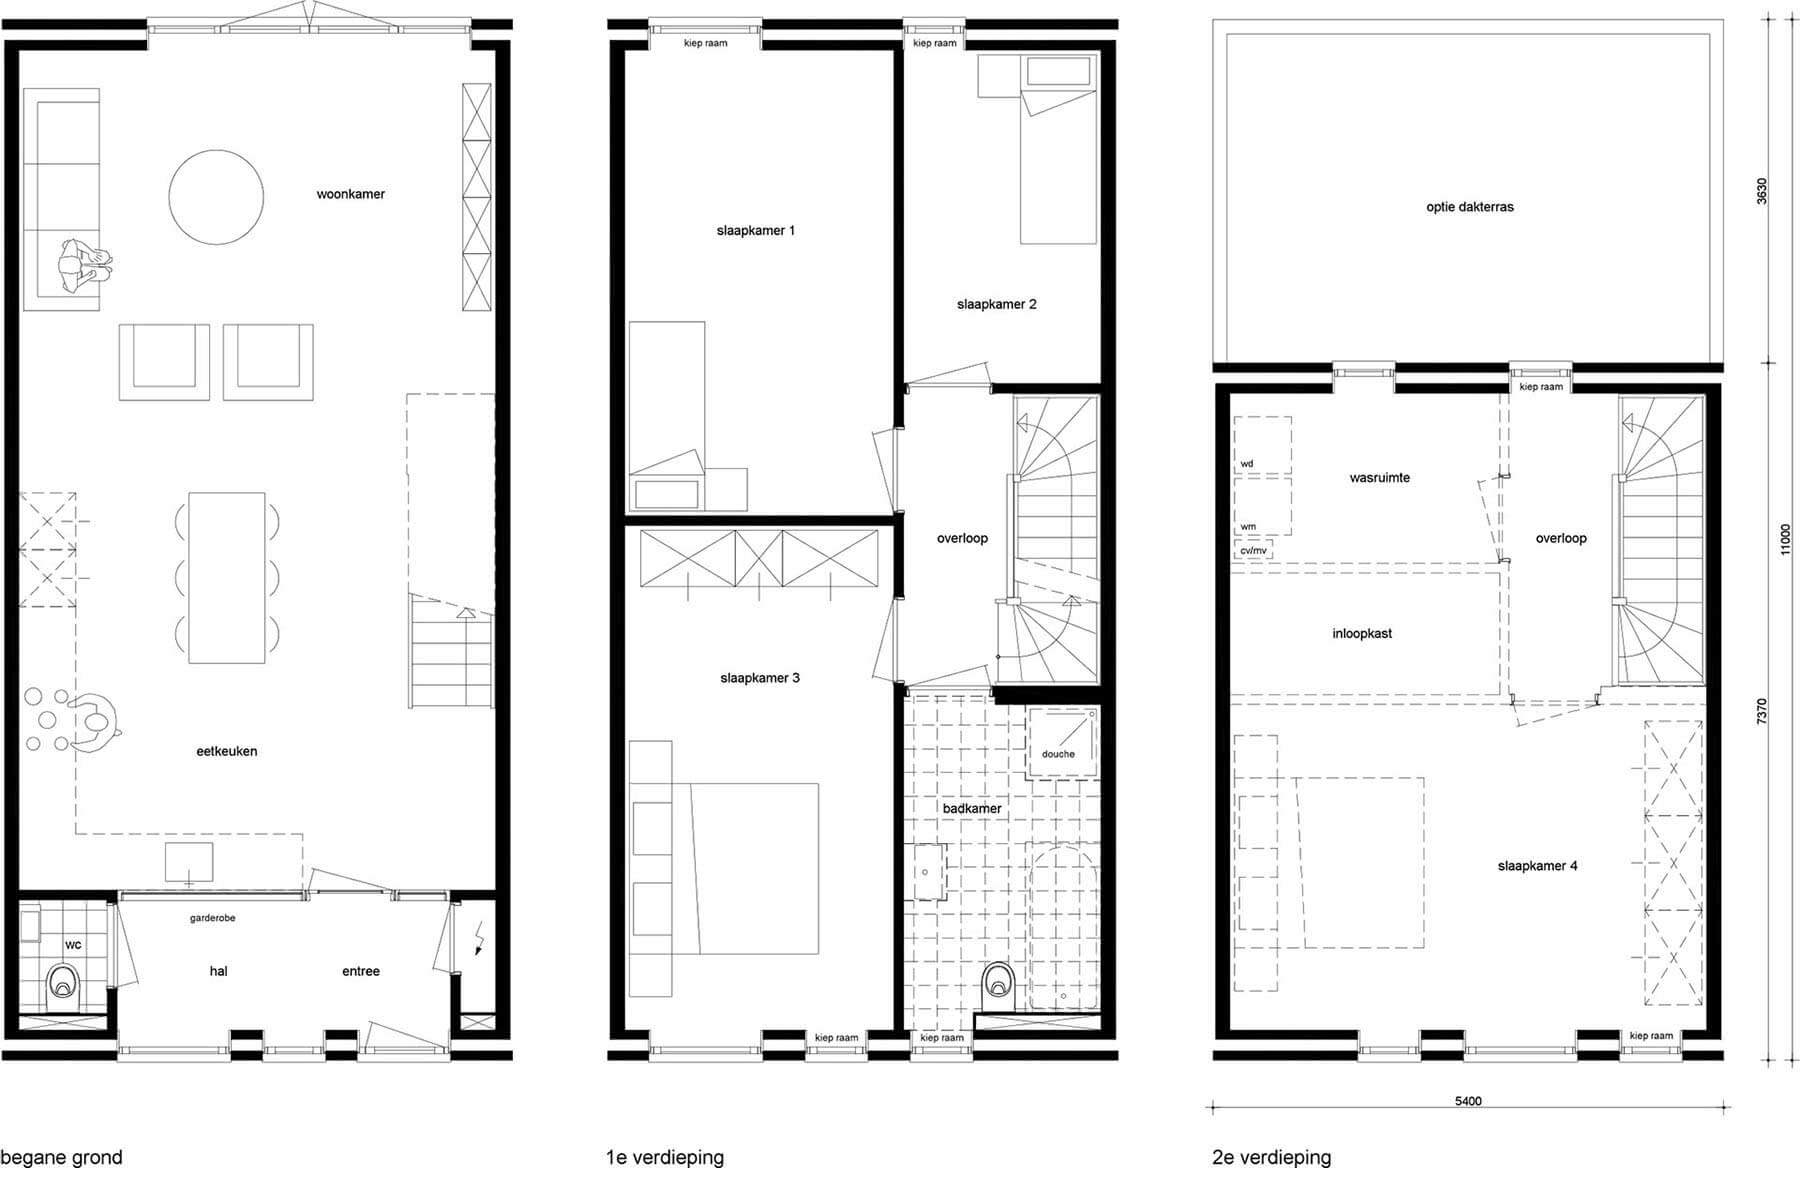 8A Architecten - Brick house, standaard kavelwoning, Kavelwoning.nl